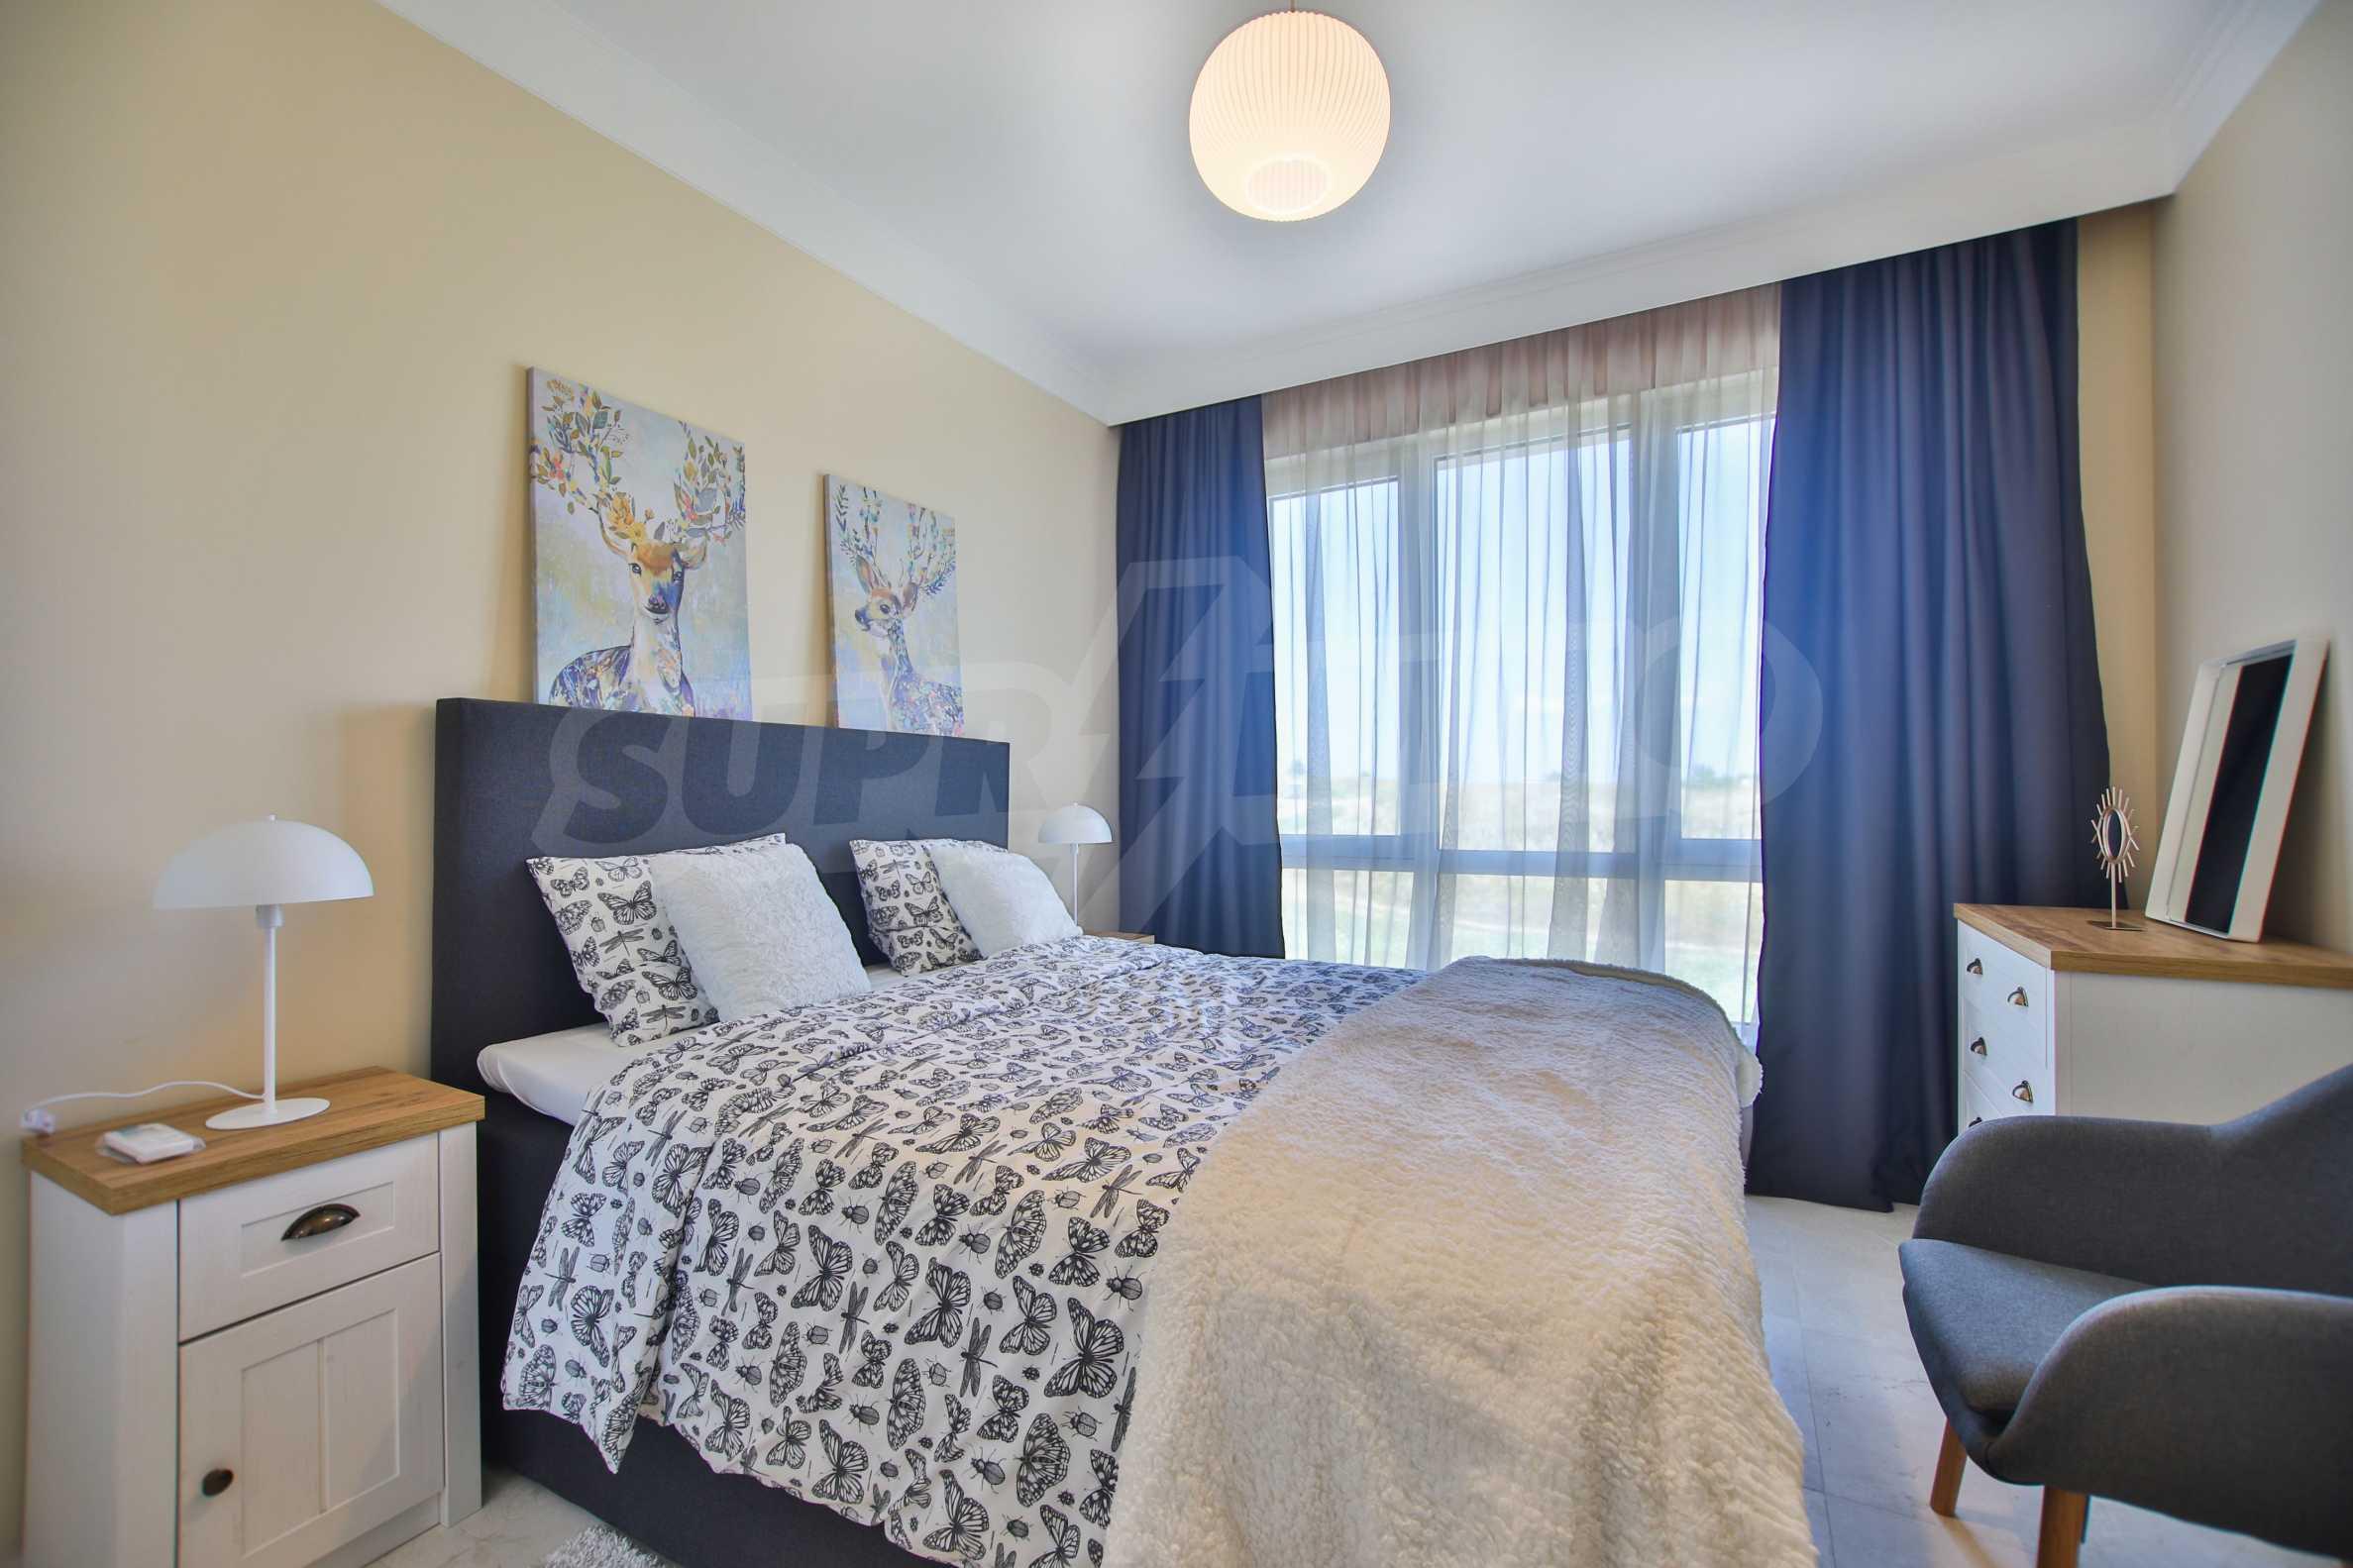 Първокласен двустаен апартамент в Belle Époque Beach Residence (ап. №A 206) 7